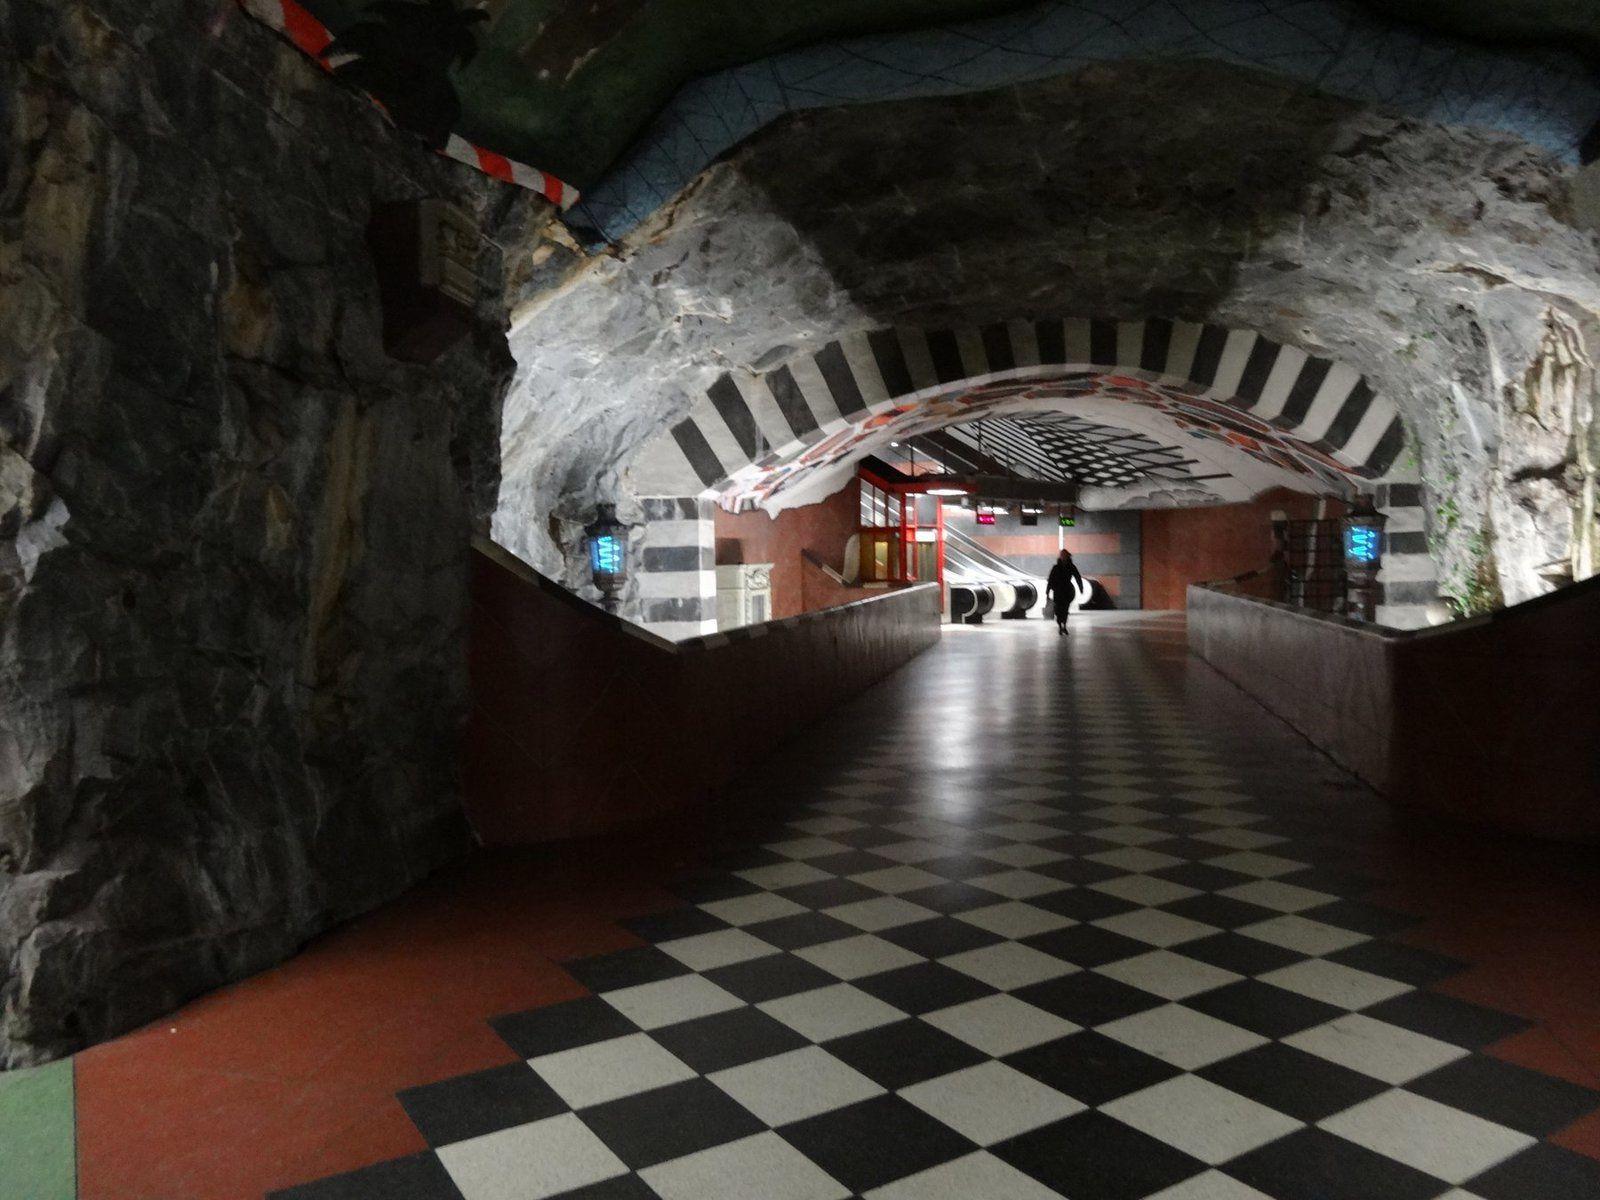 La station de Métro Kungstradgarden à Stockholm